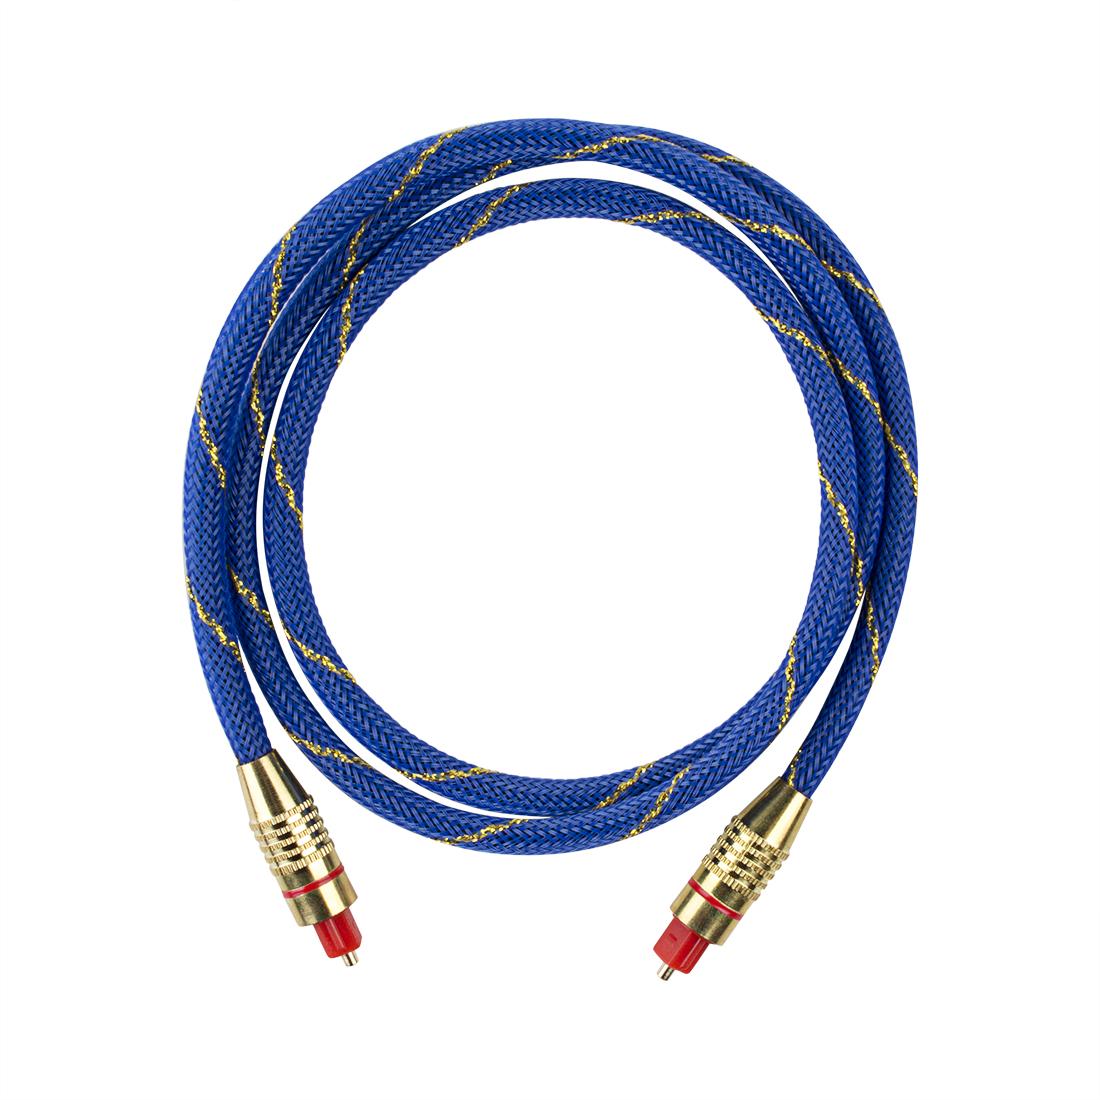 Premium Gold Plated Digital Optical Fiber Audio Cable TV Cord OD 6.0 SP 1M Length